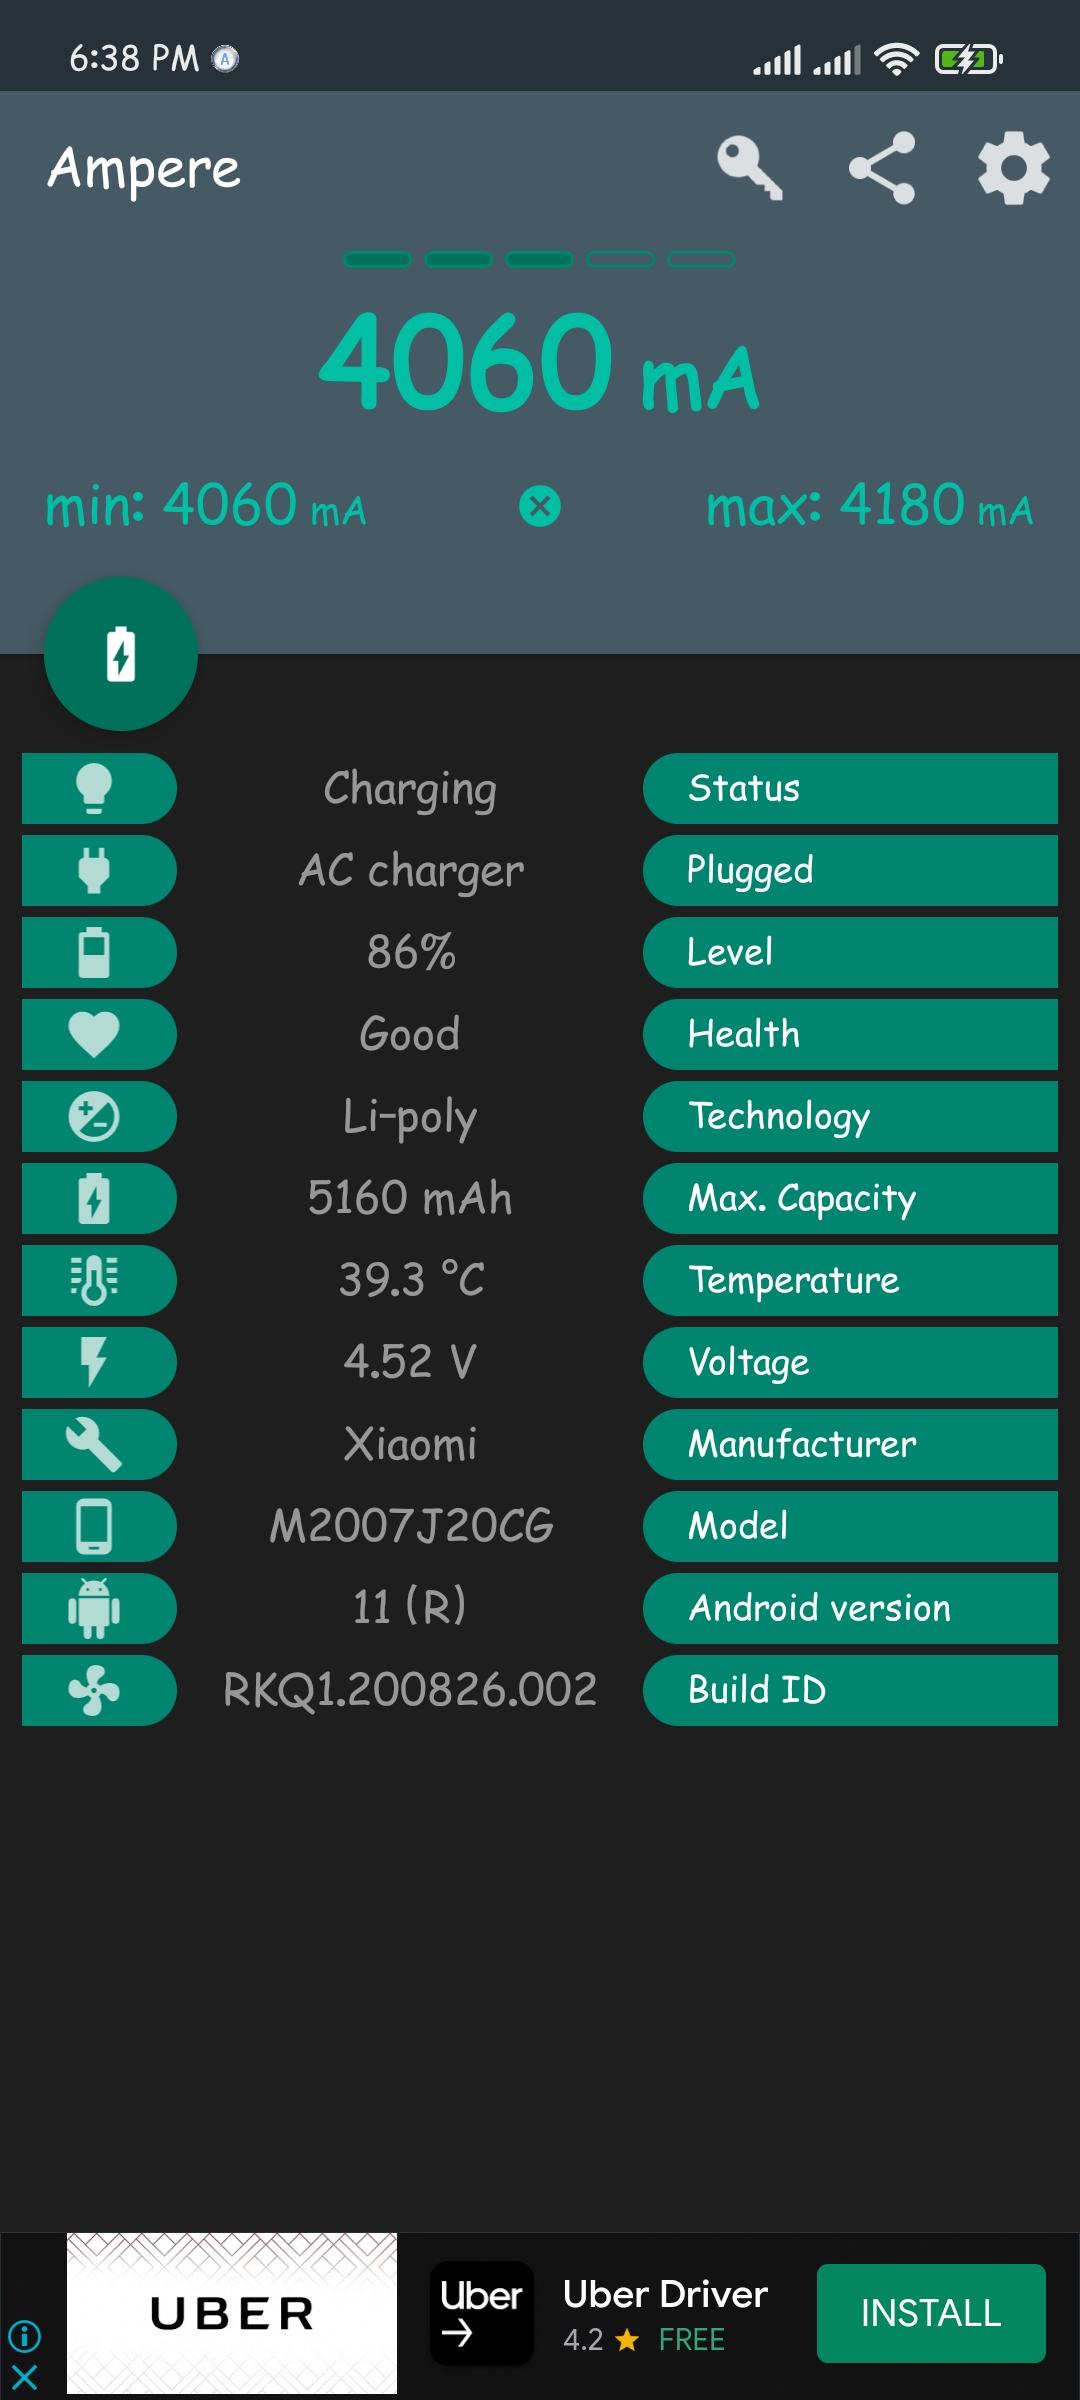 Screenshot_2021-07-28-18-38-01-502_com.gombosdev.ampere.jpg